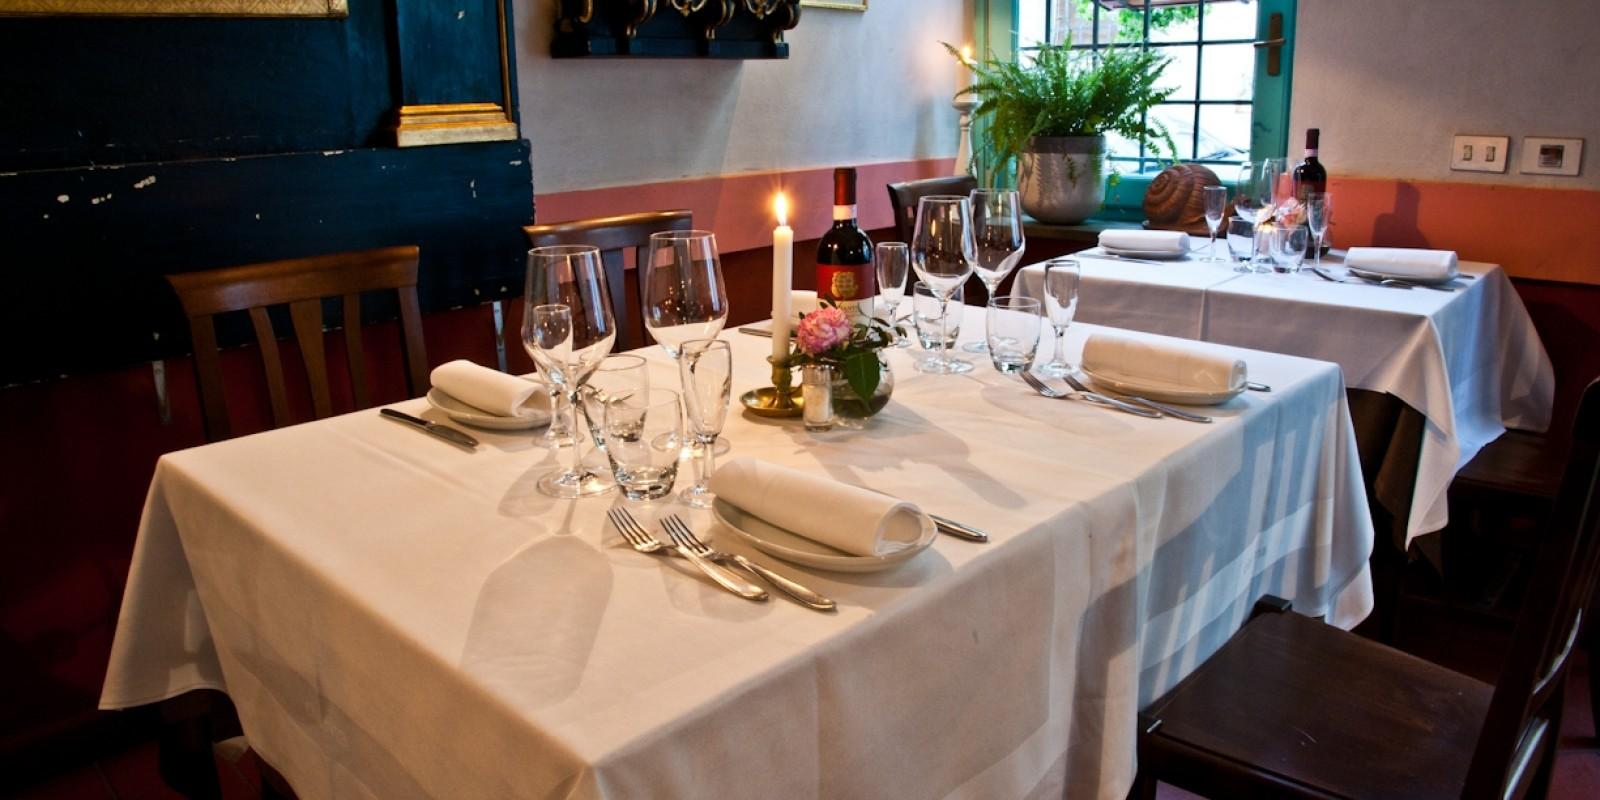 Cucina del garga firenze home ricette segreti culinari - La cucina del garga ...